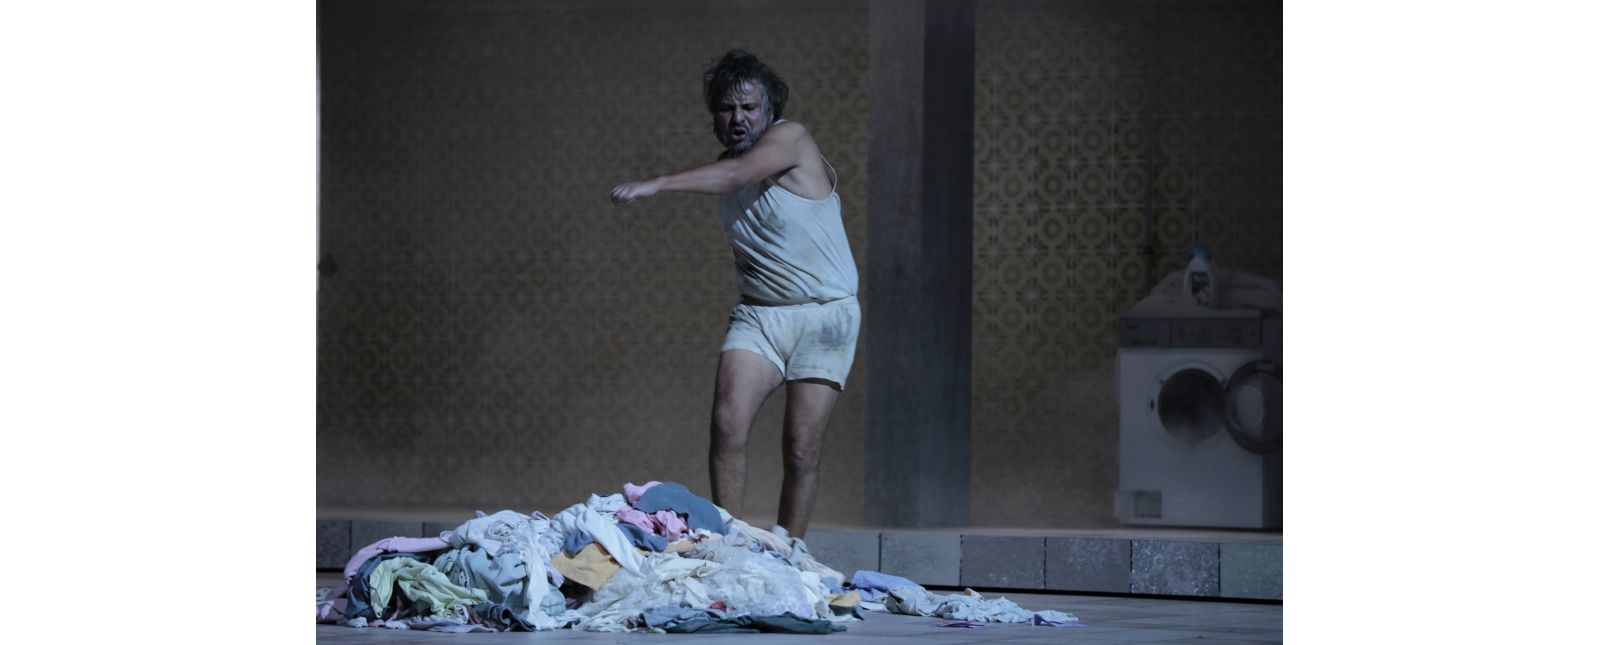 Falstaff // Juan Orozco // 2019 // Paul Leclaire